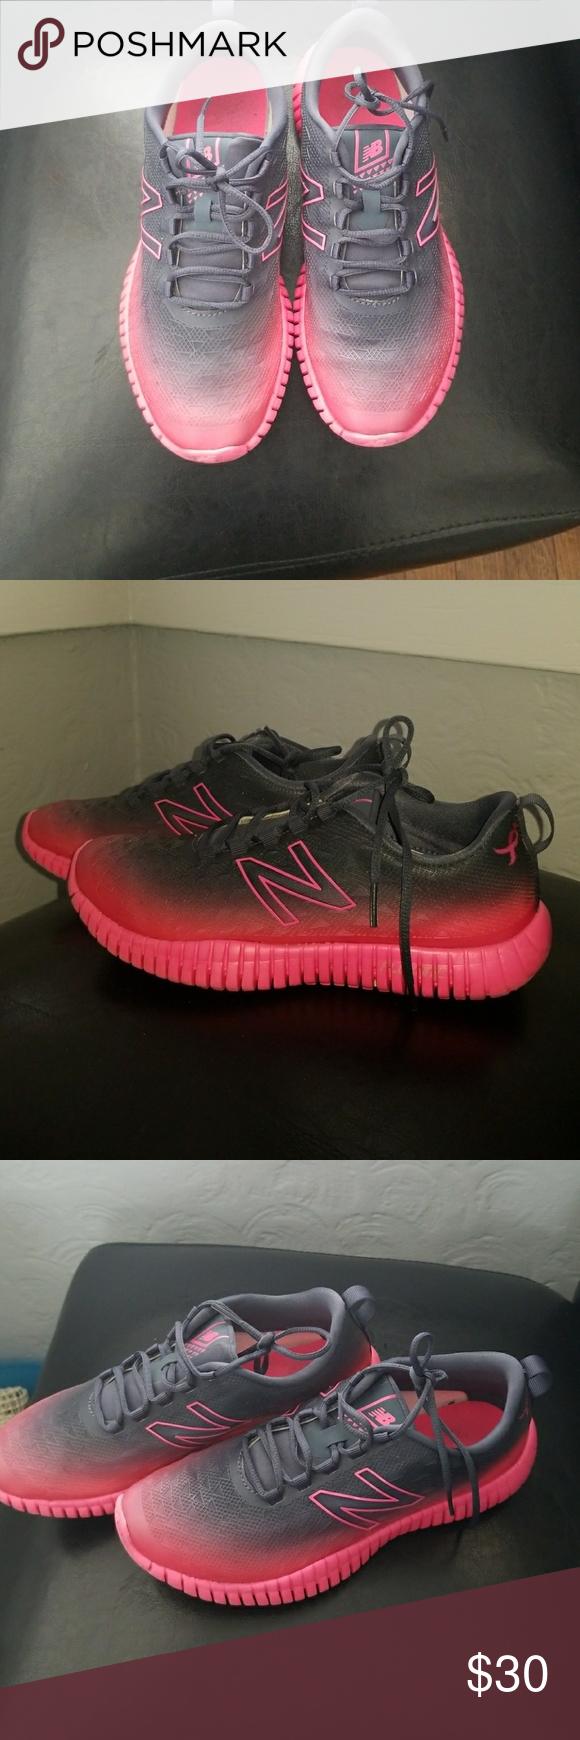 Hot Zapatos Pink Nike Free Zapatos Hot Cancer Slocog 1dea4d